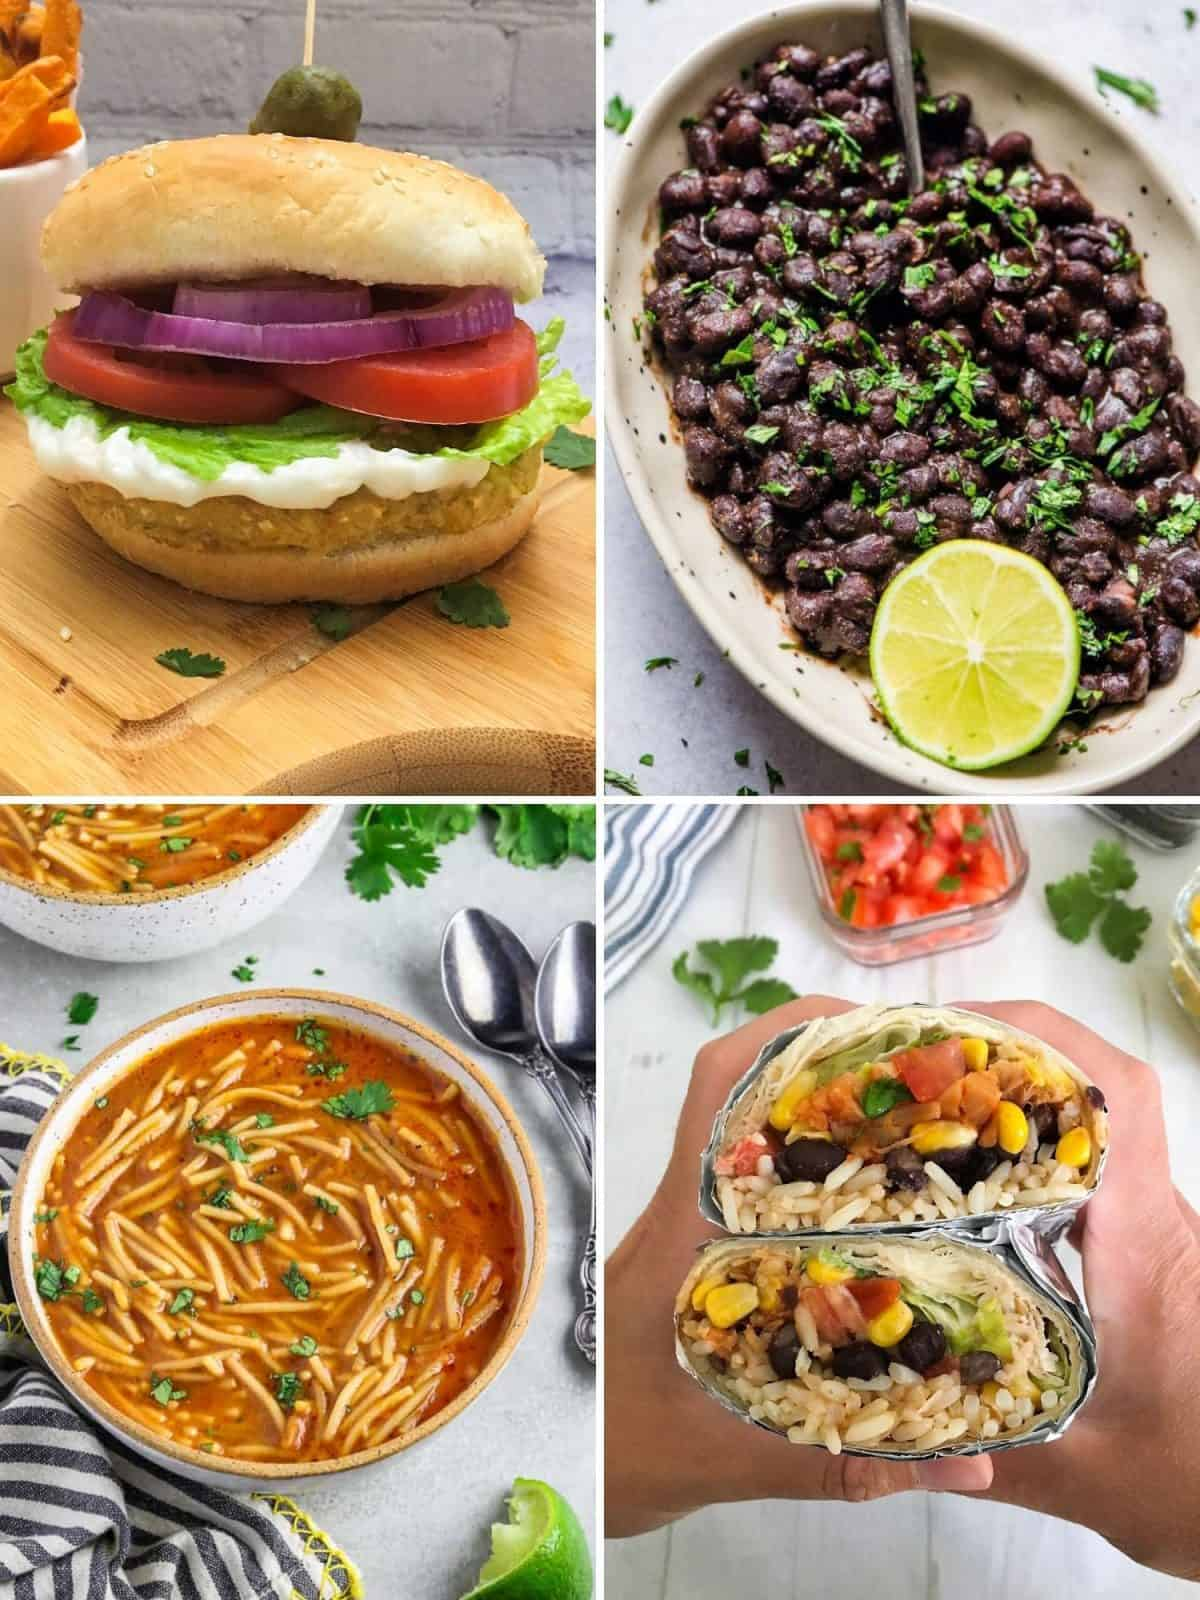 collage of 4 recipes: burger, black beans, noodle soup, burrito